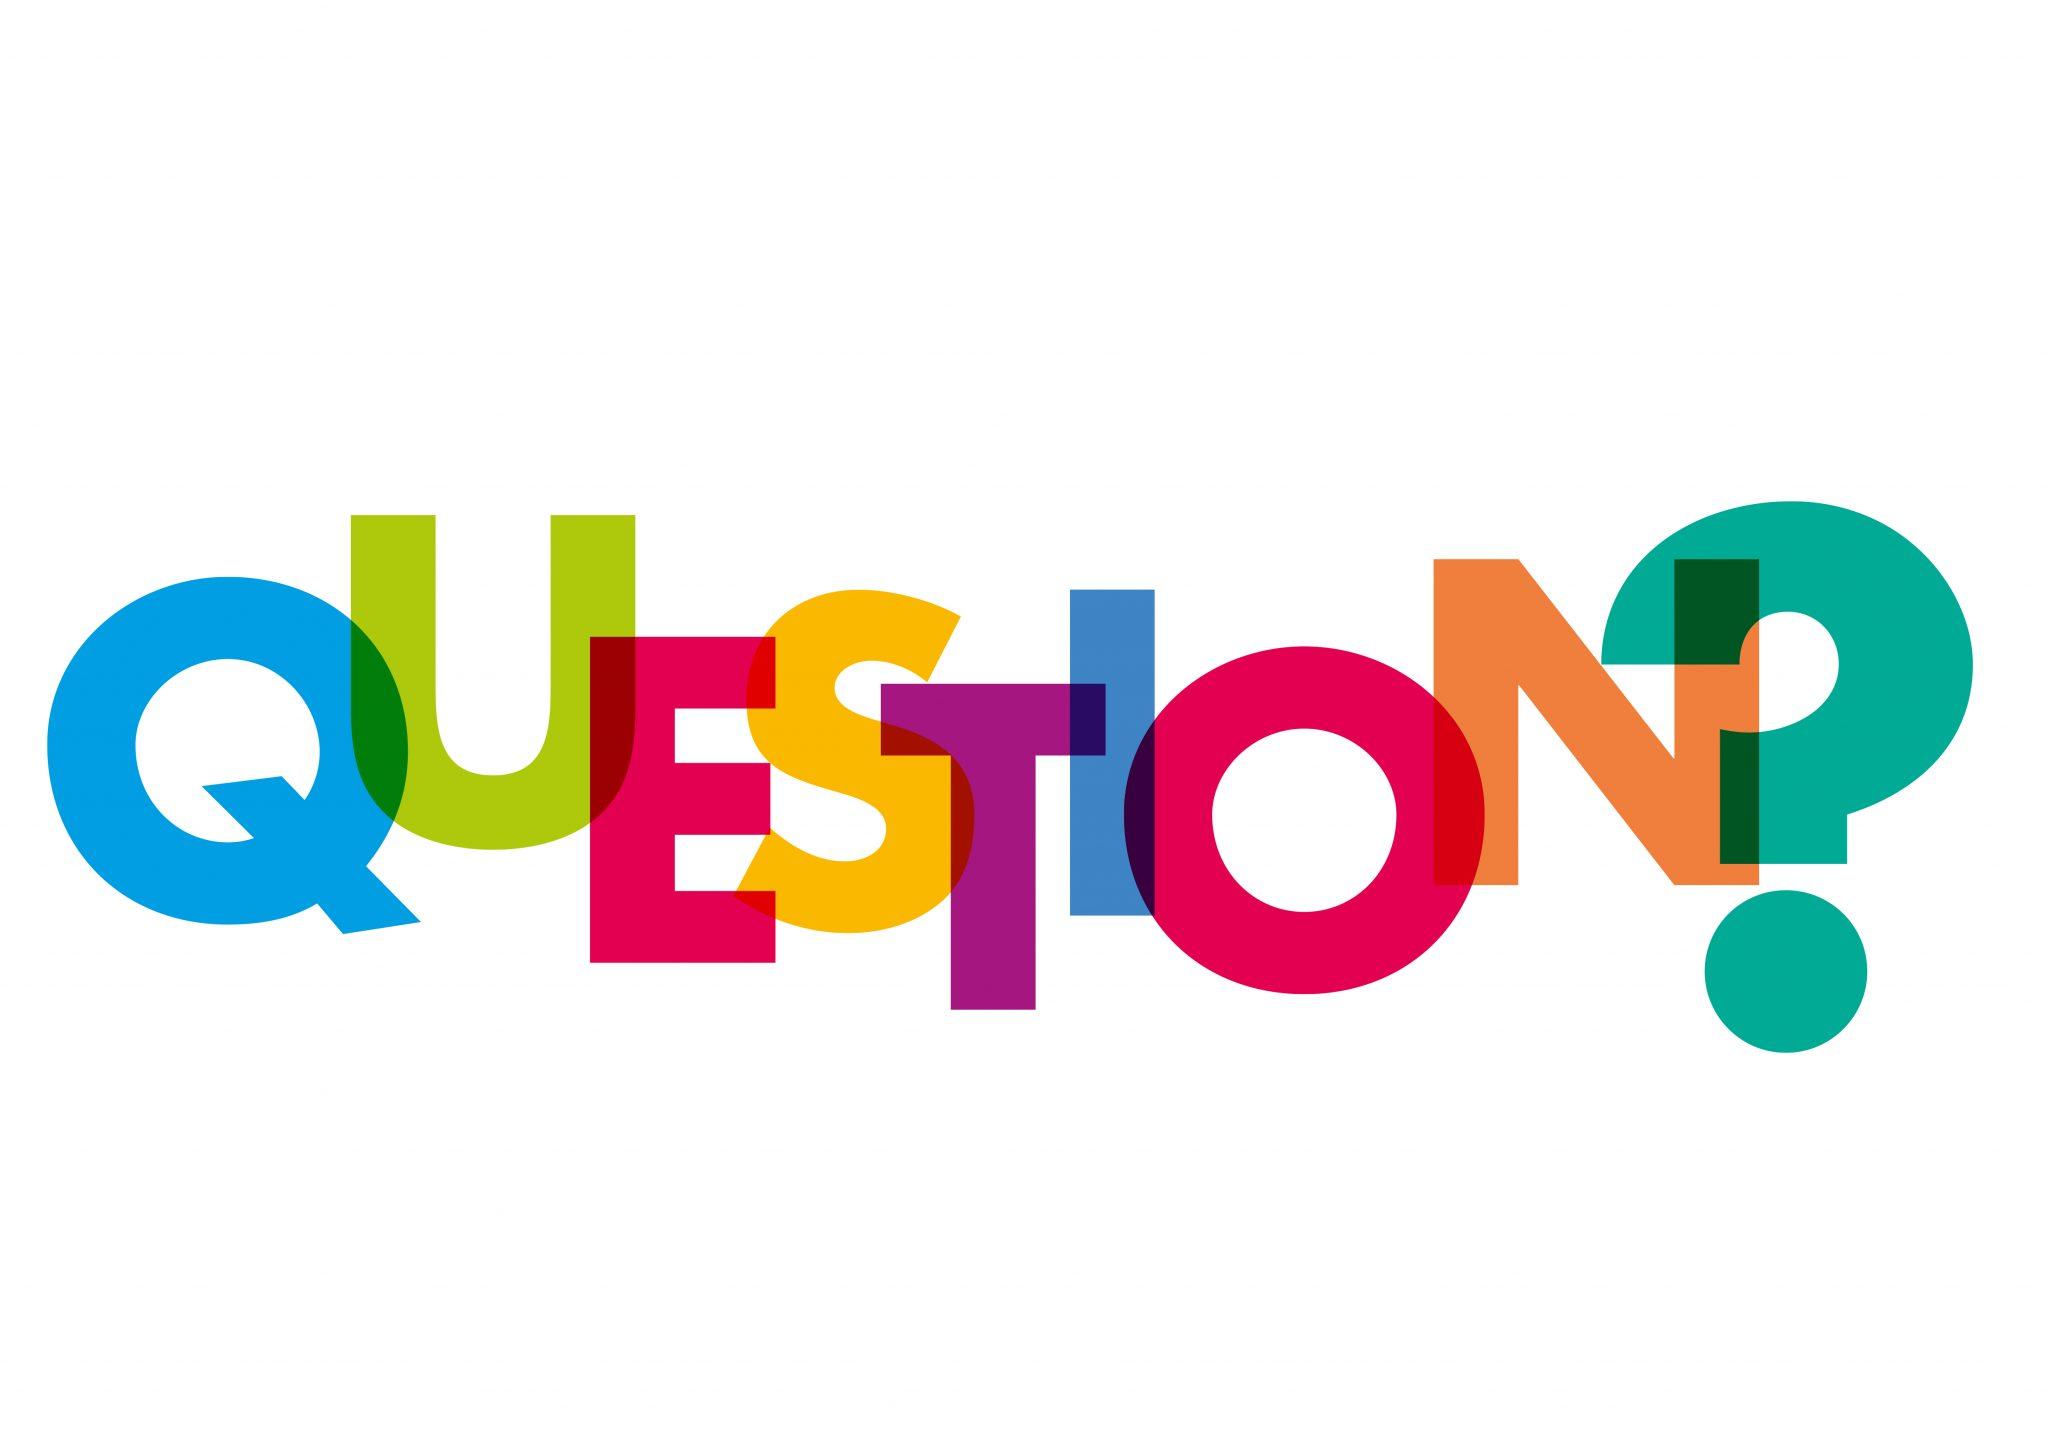 Questione - SQ3R